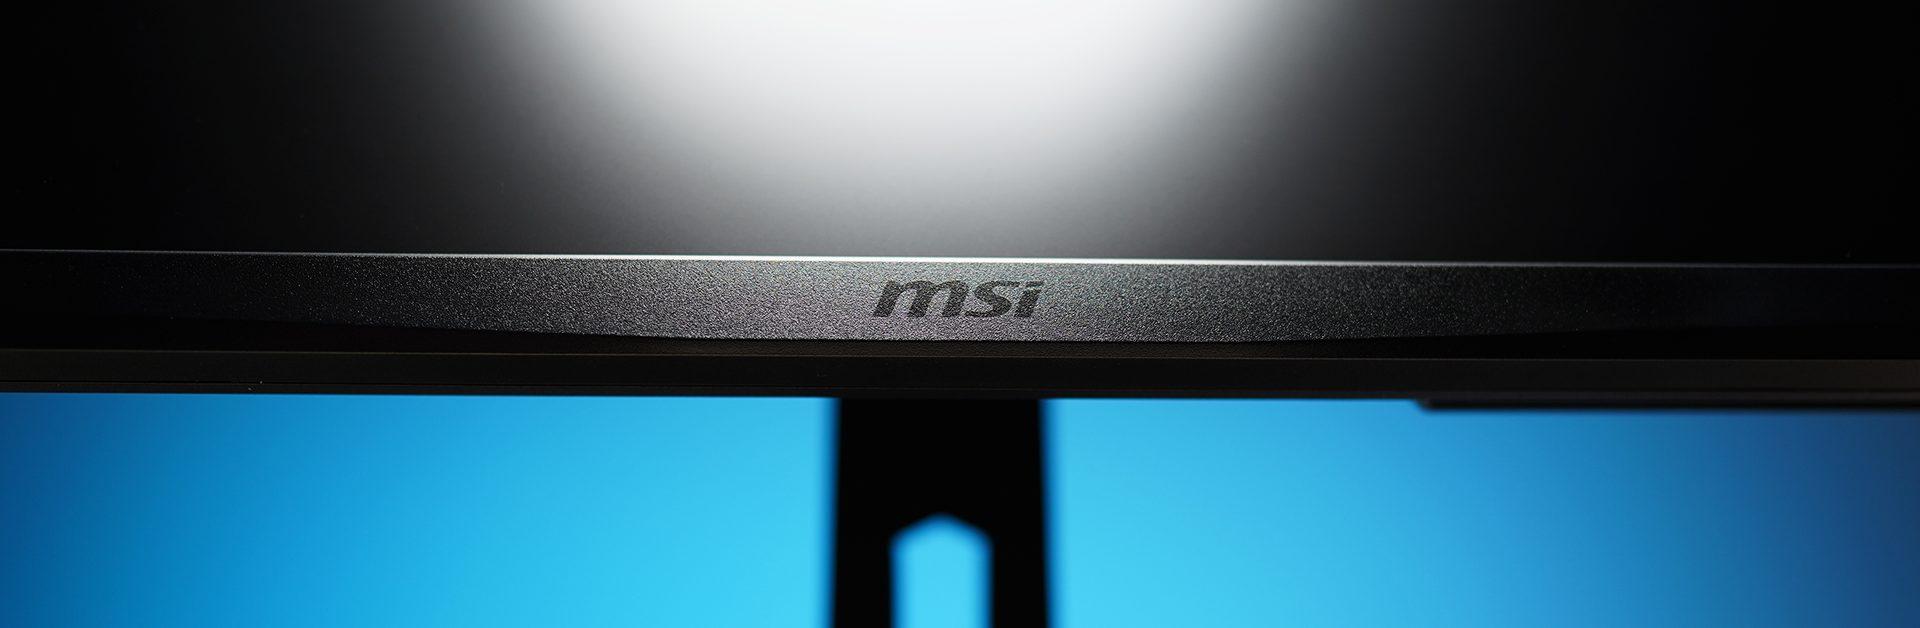 MSI Oculux NXG253R - MSI Logo